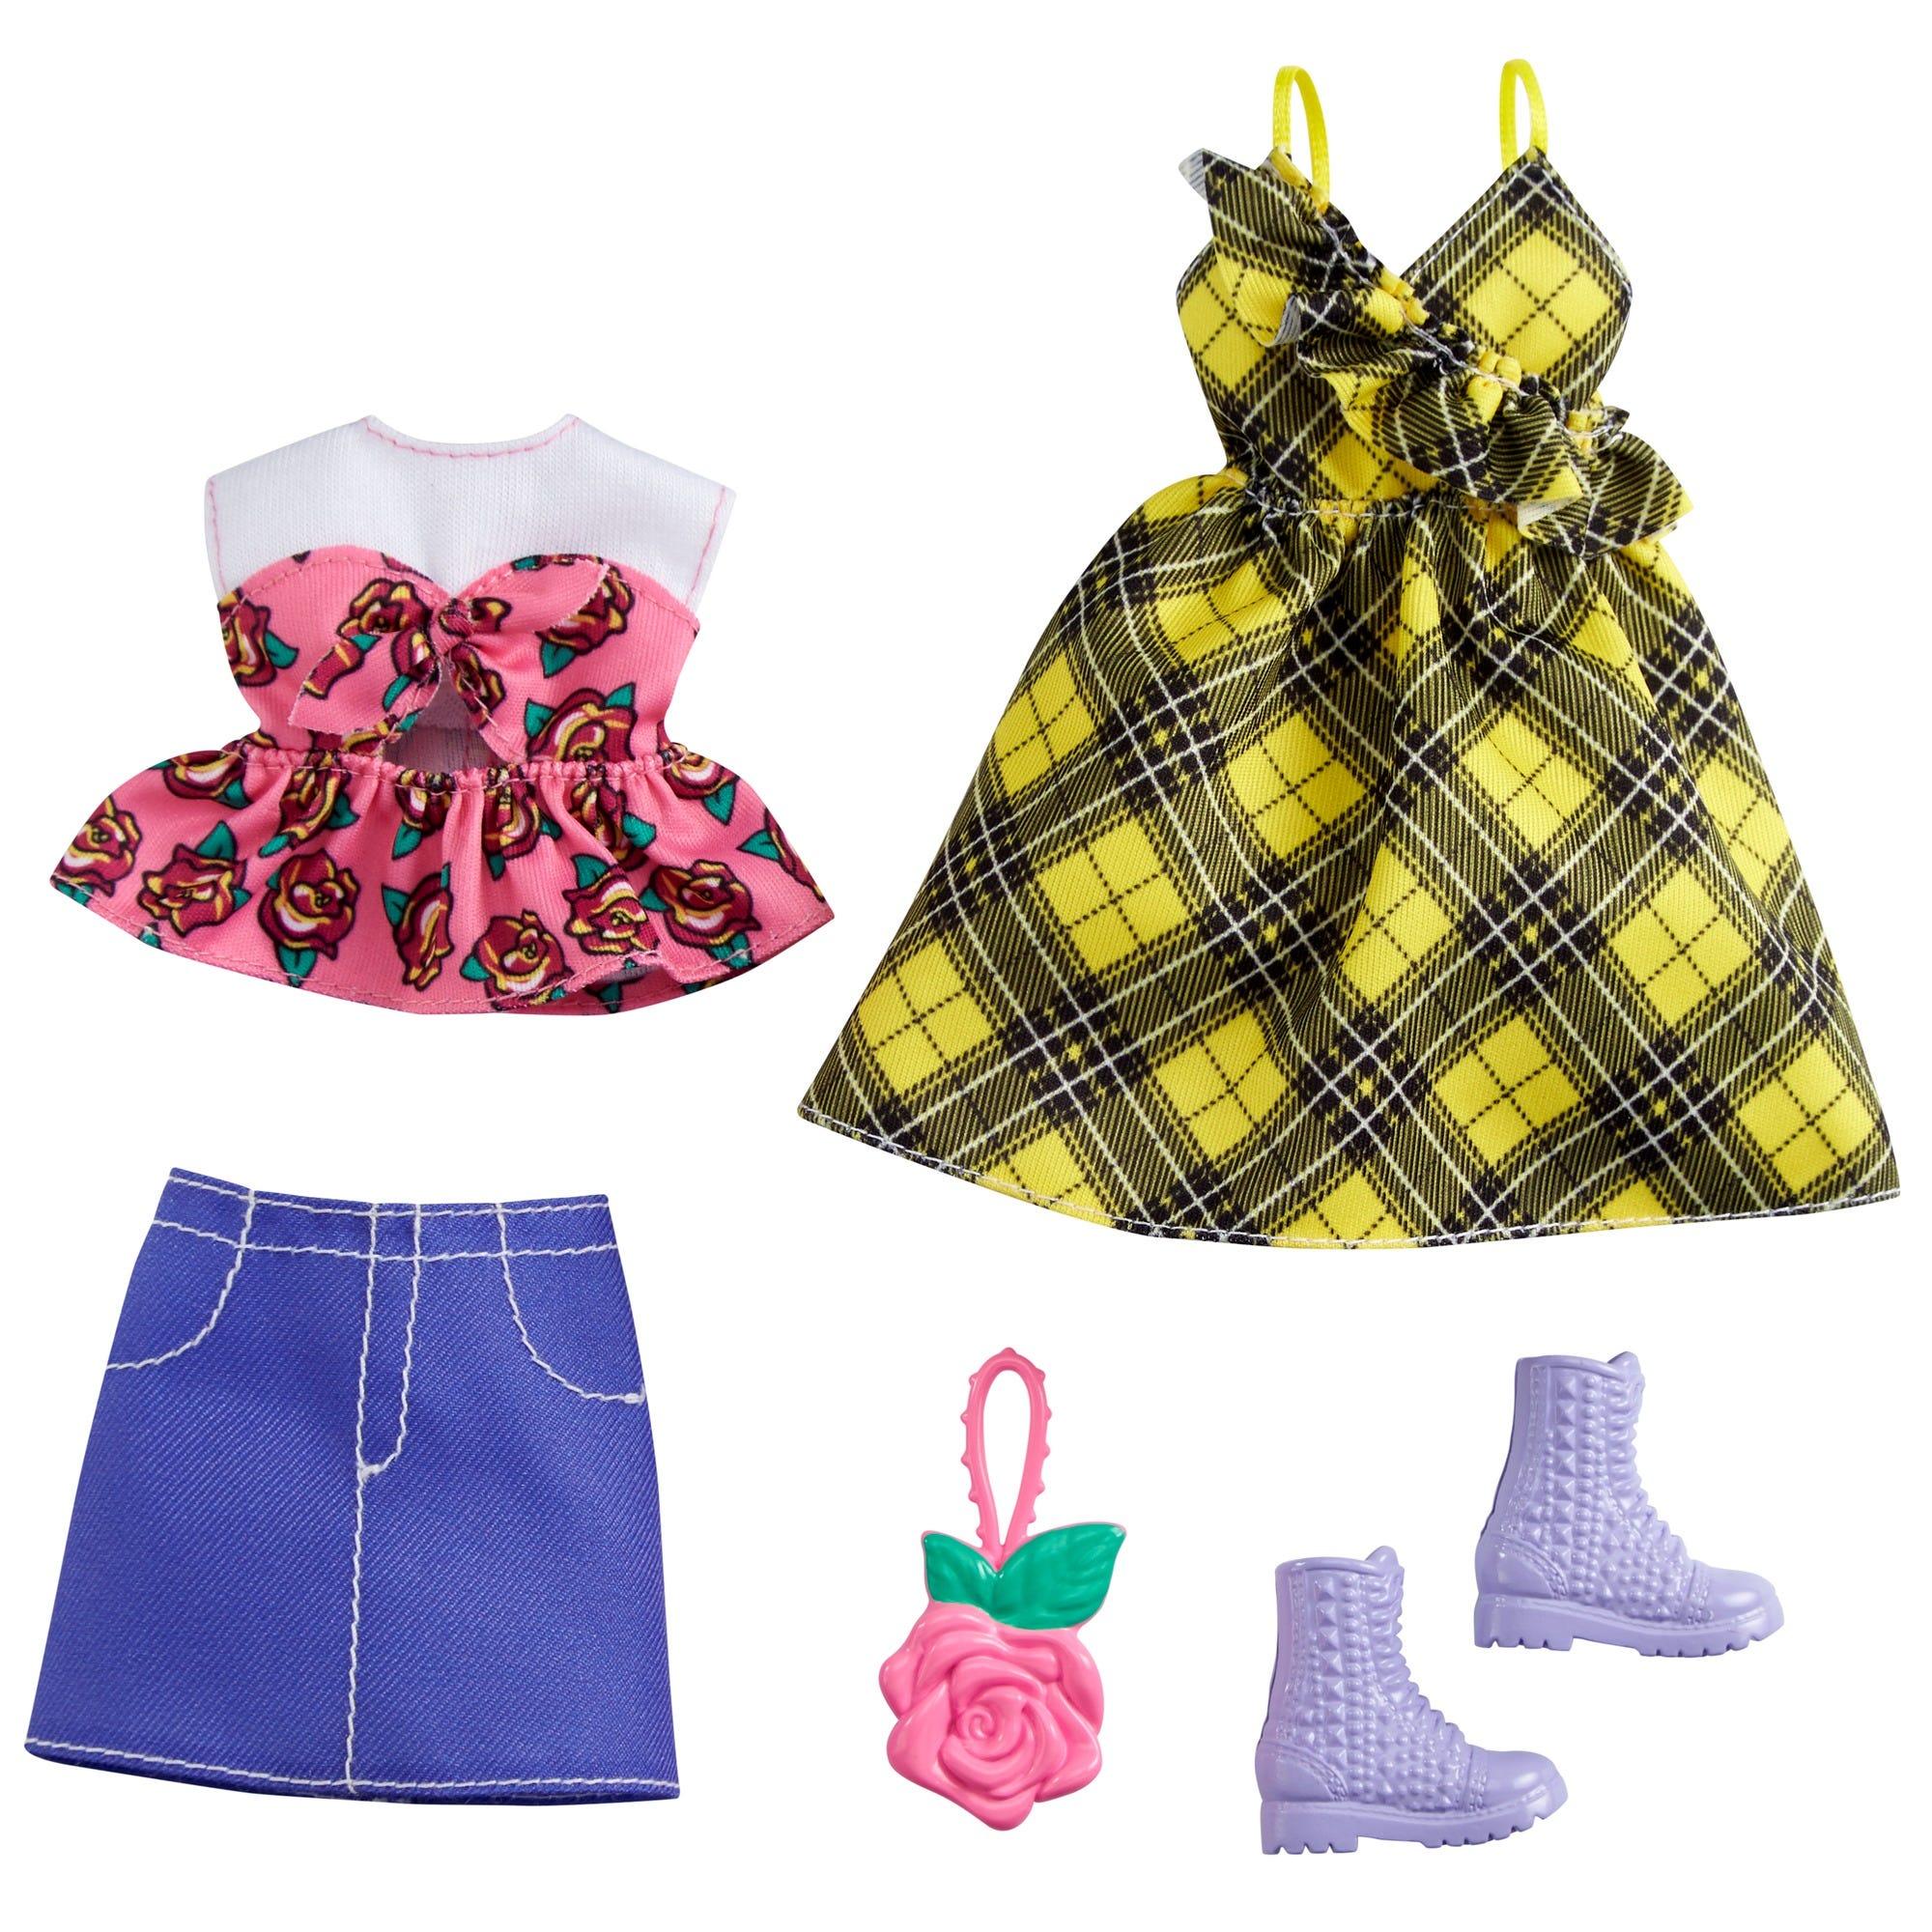 Barbie Fashion 2 Packs Assortment